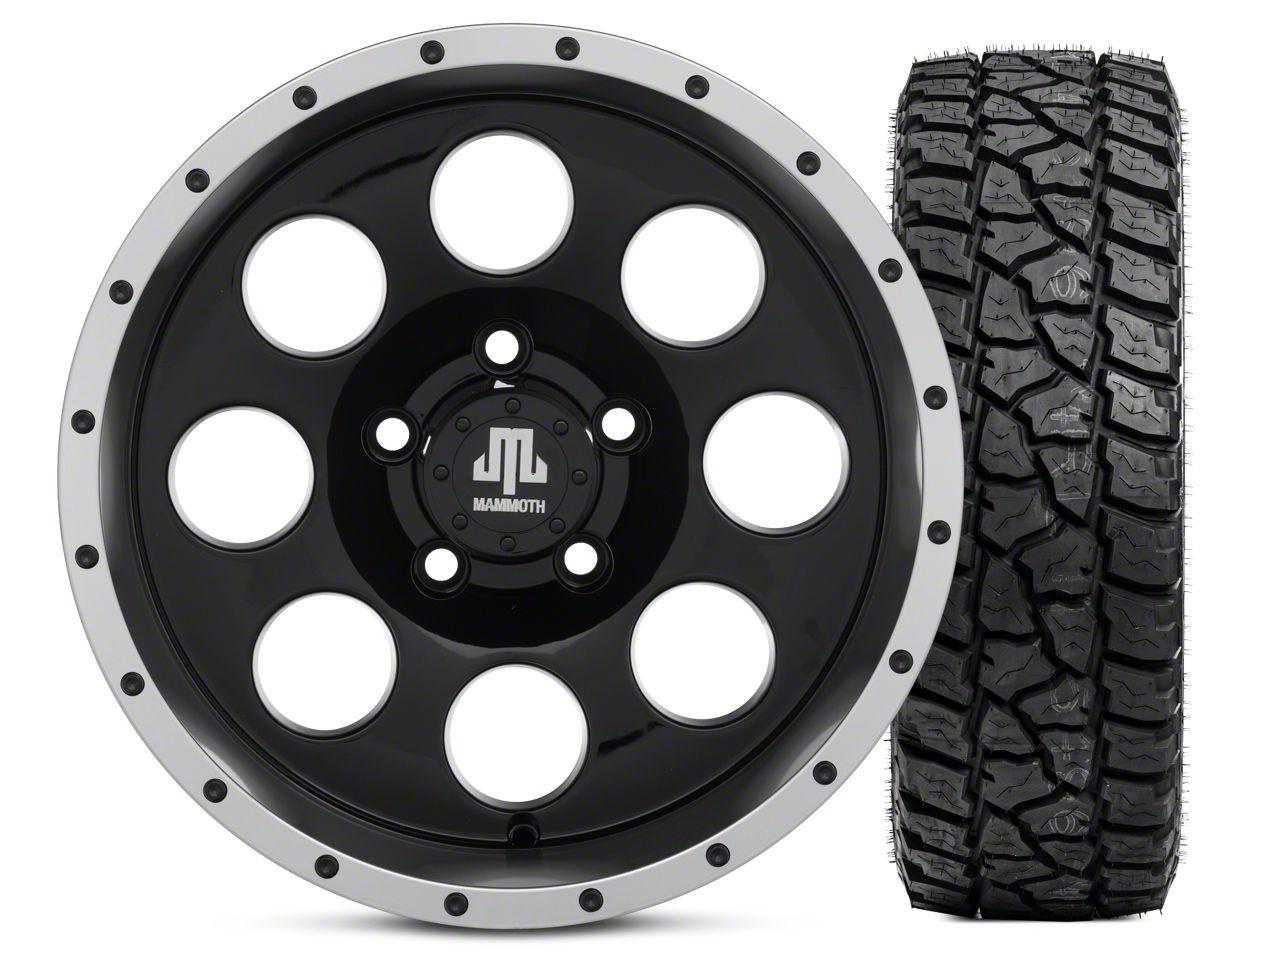 Mammoth 8 Beadlock 15x8 Wheel & Mickey Thompson Baja ATZP3 33X12.50R15LT Tire Kit (5) (87-06 Jeep Wrangler YJ & TJ)